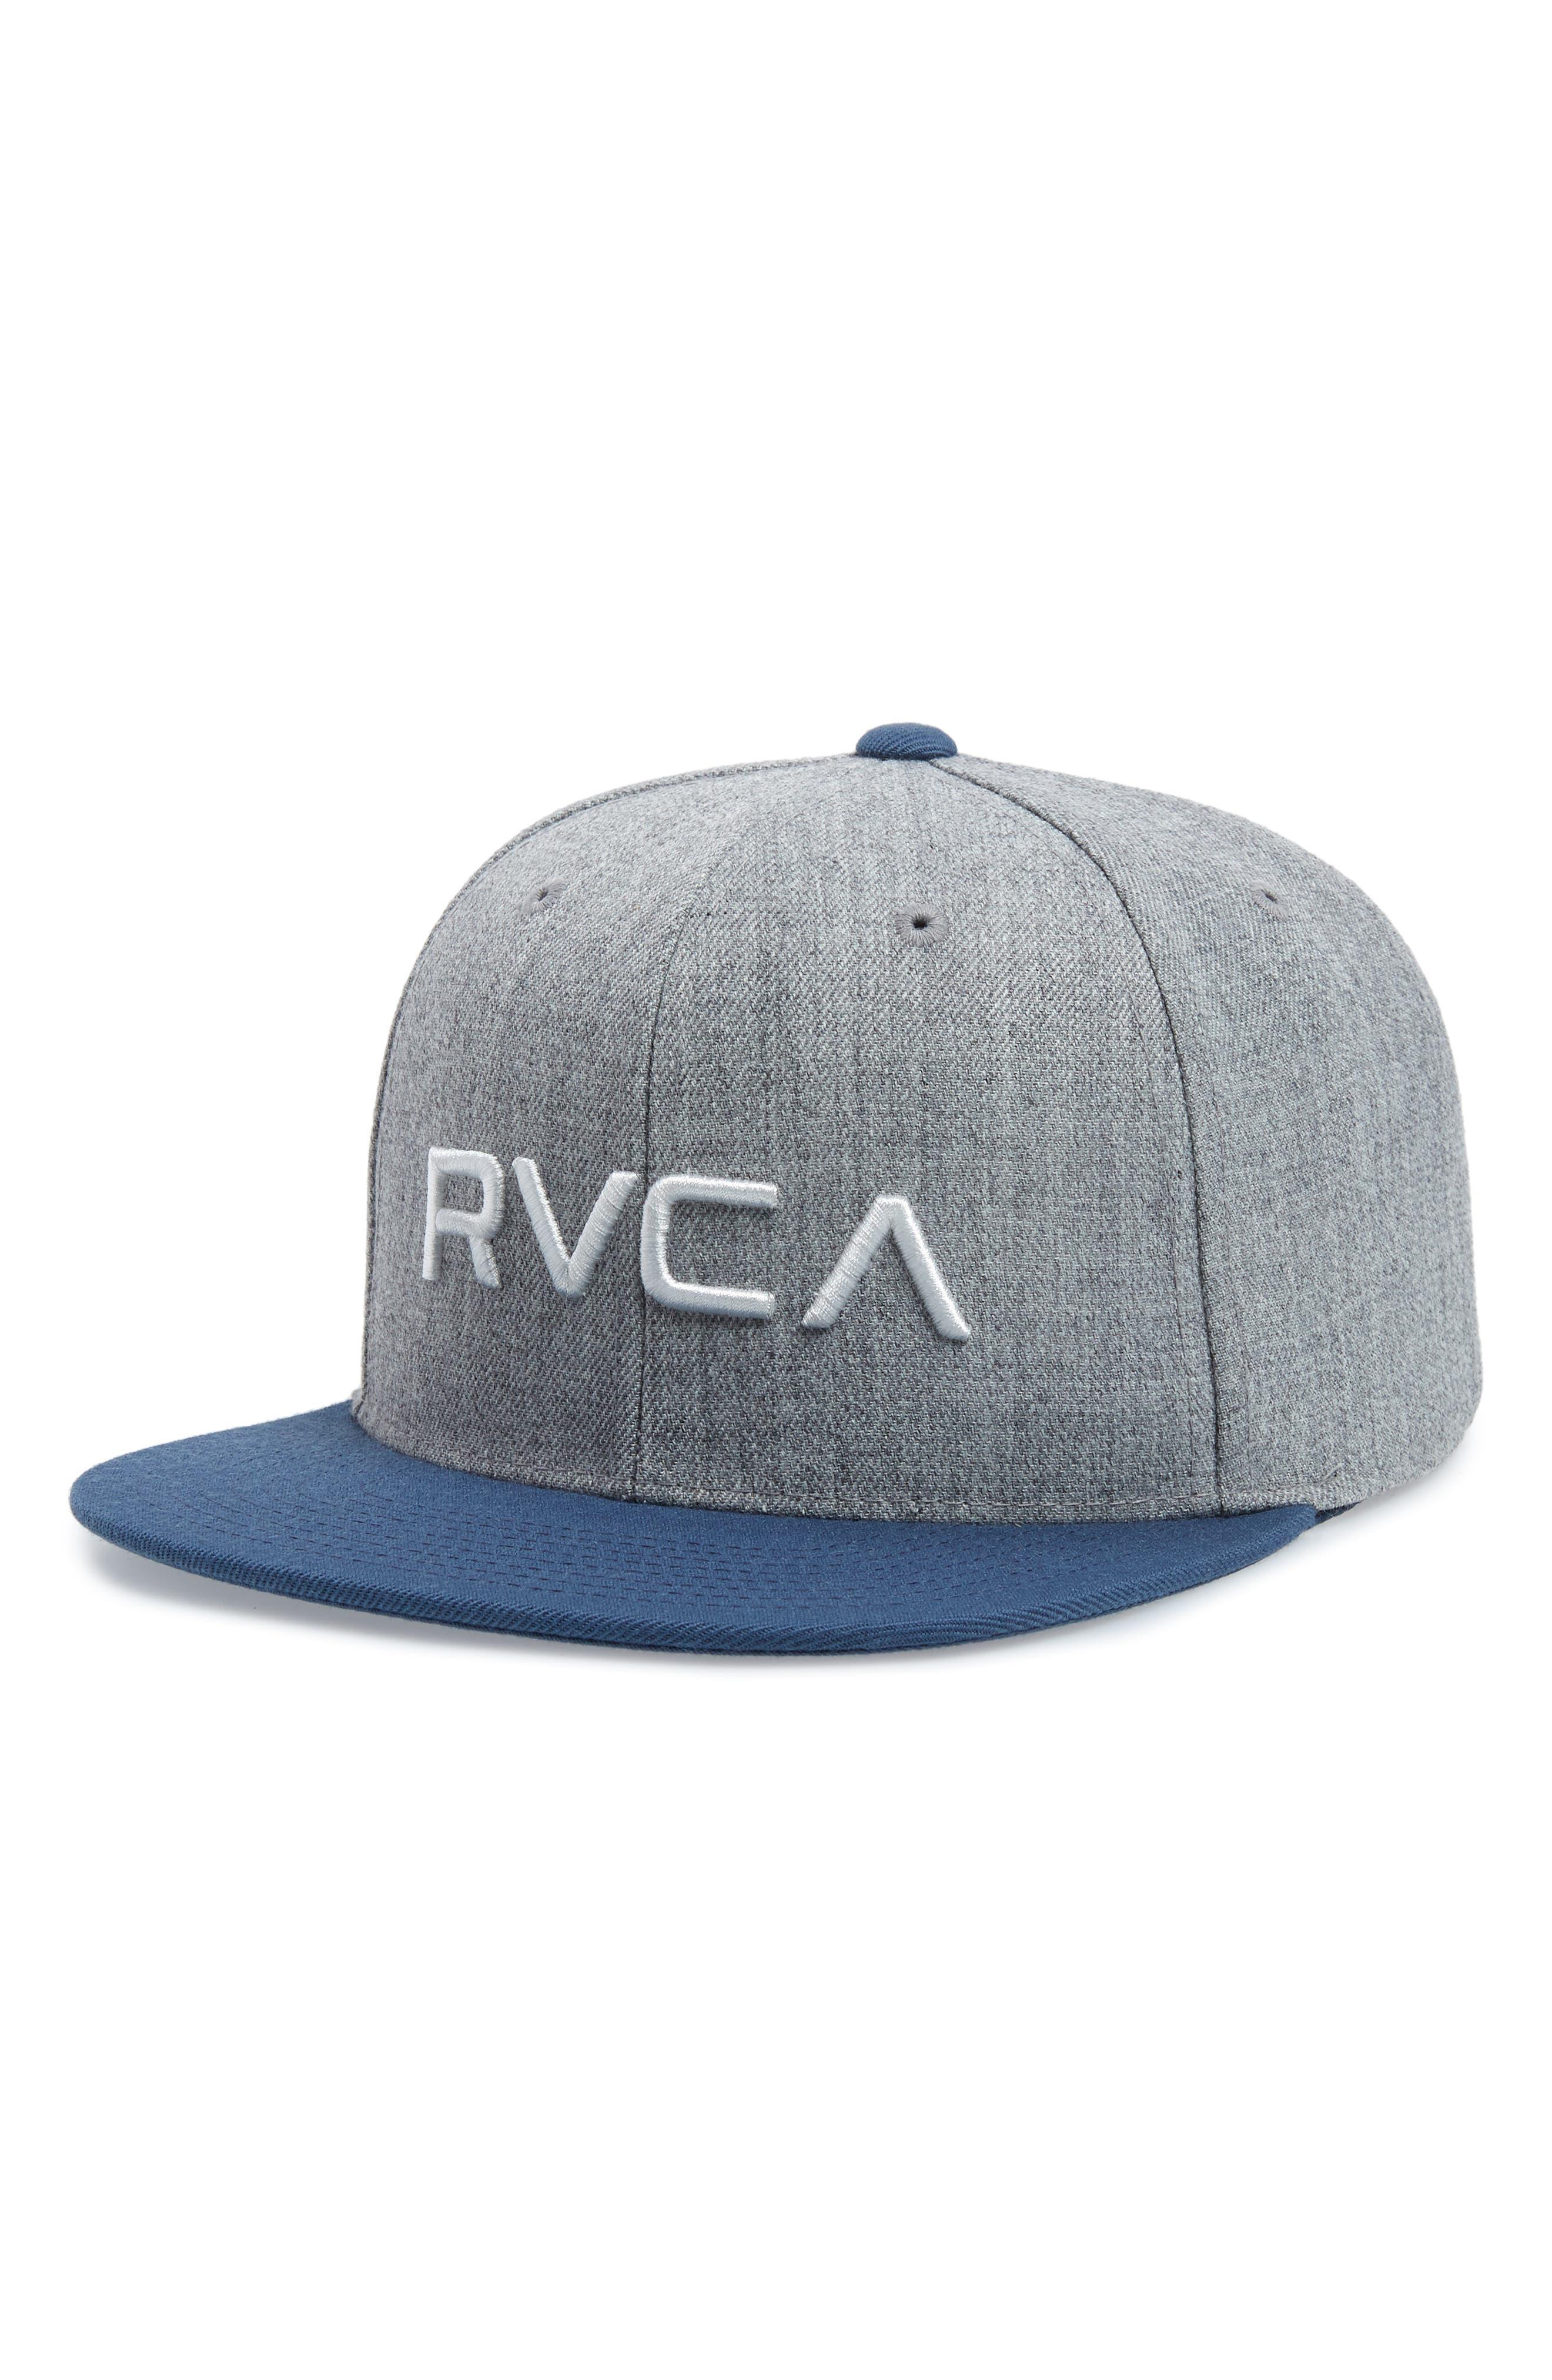 RVCA, Twill Snapback Baseball Cap, Main thumbnail 1, color, GREY BLUE